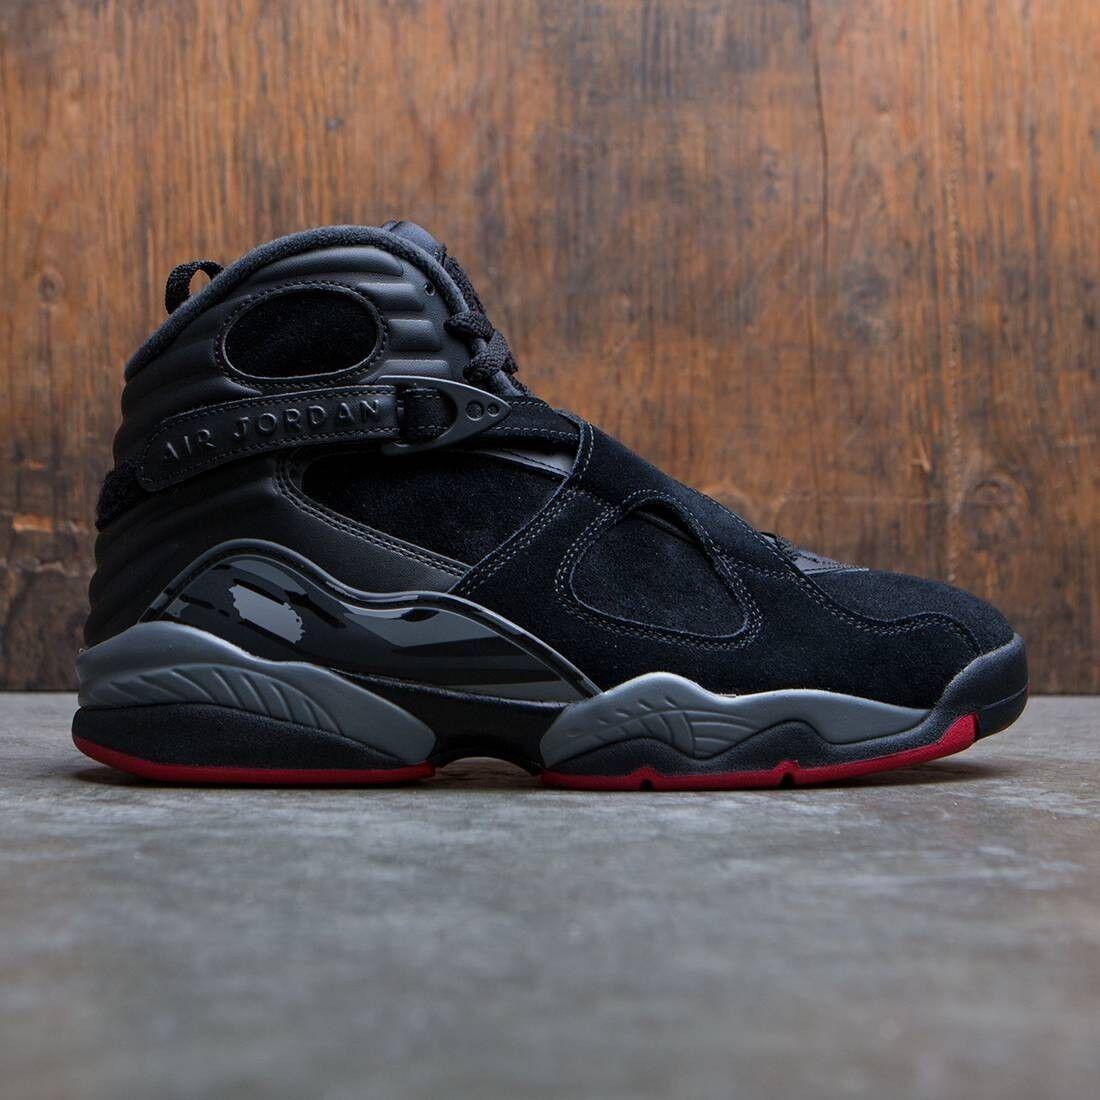 free shipping 97188 cc935 2017 Nike Nike Nike Air Jordan 8 VIII Retro Black Gym Red Size 12. 305381